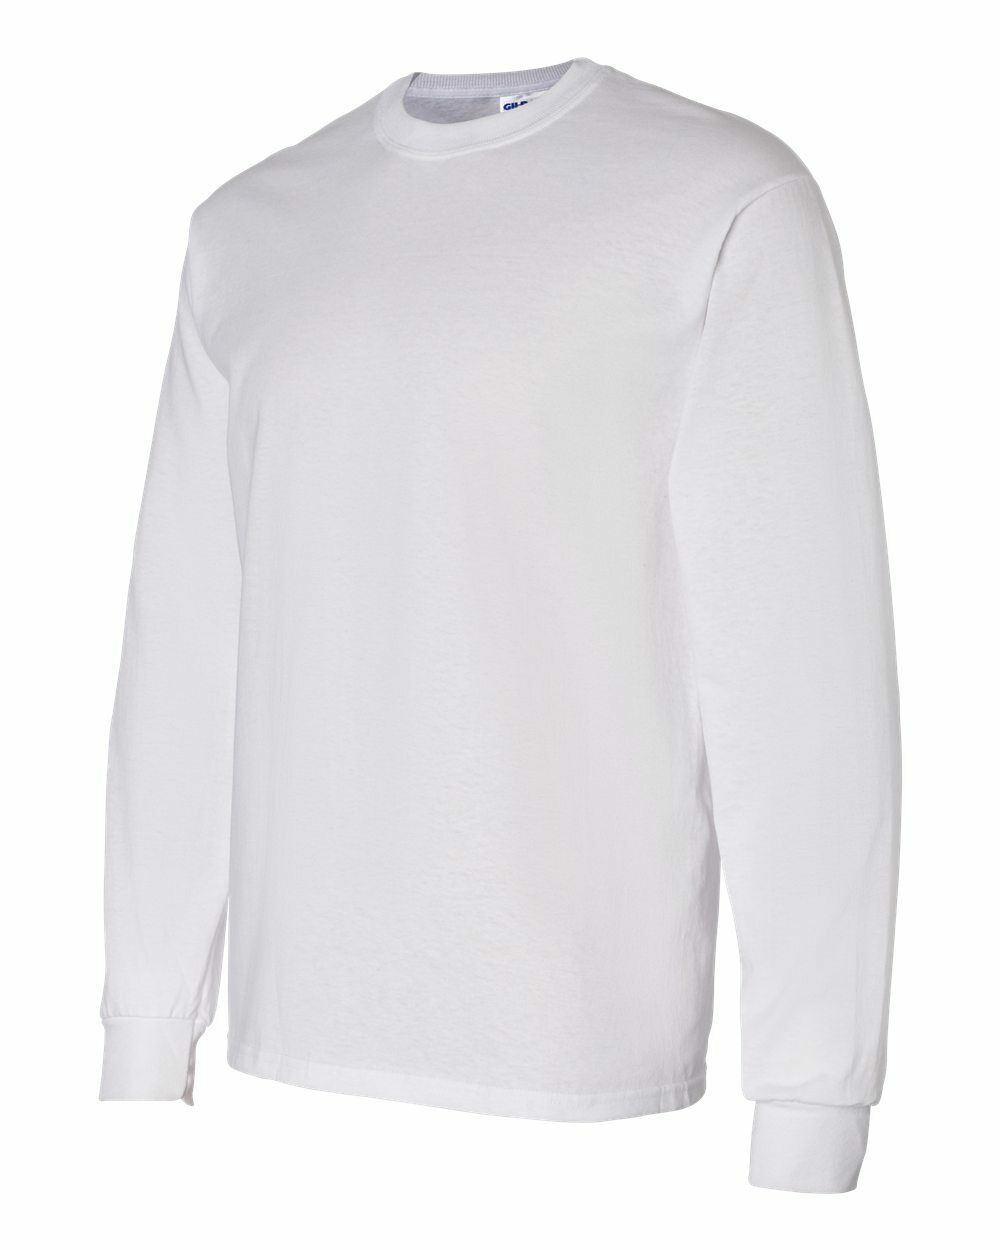 6 BLANK Weiß GILDAN Long Sleeve T-Shirts Heavyweight S M L XL 2XL 3XL BULK LOT